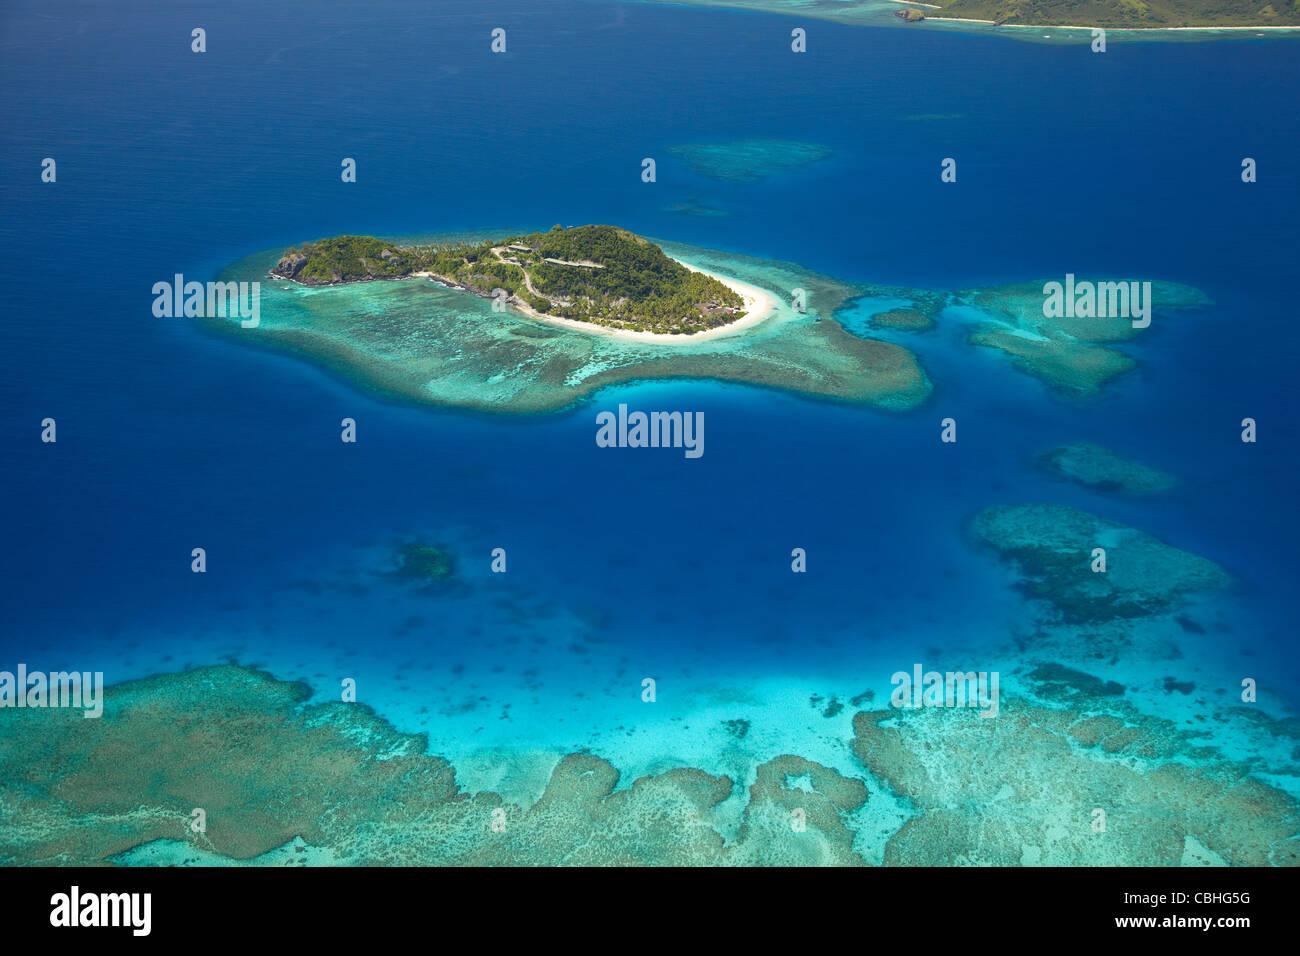 Matamanoa Island and coral reef, Mamanuca Islands, Fiji, South Pacific - aerial - Stock Image